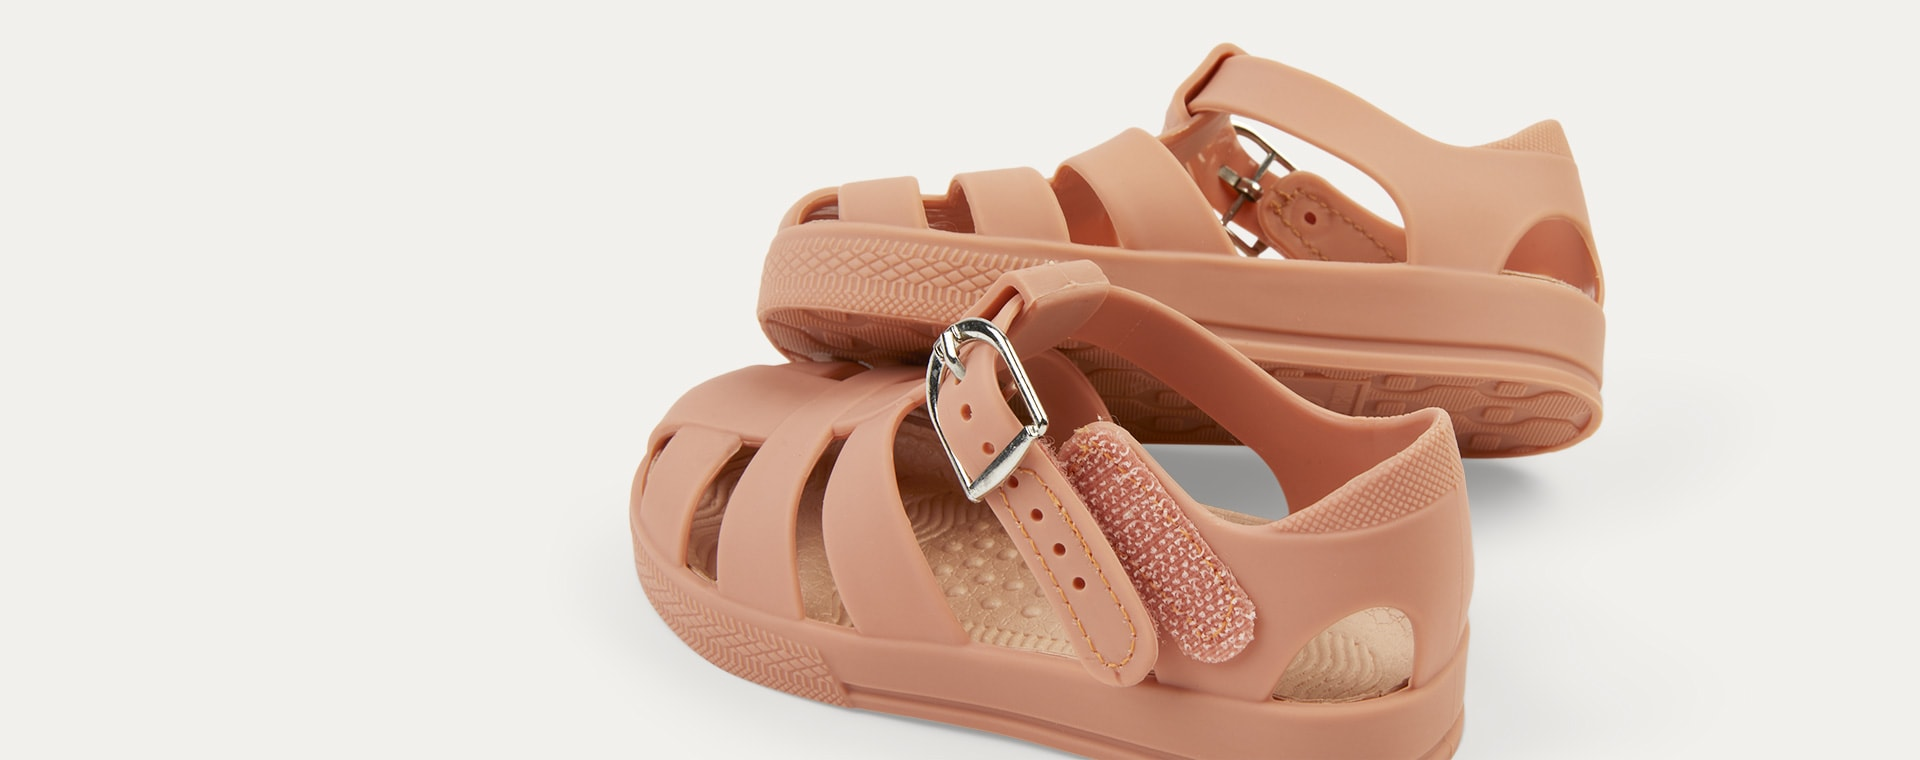 Coral KIDLY Label Jelly Sandal